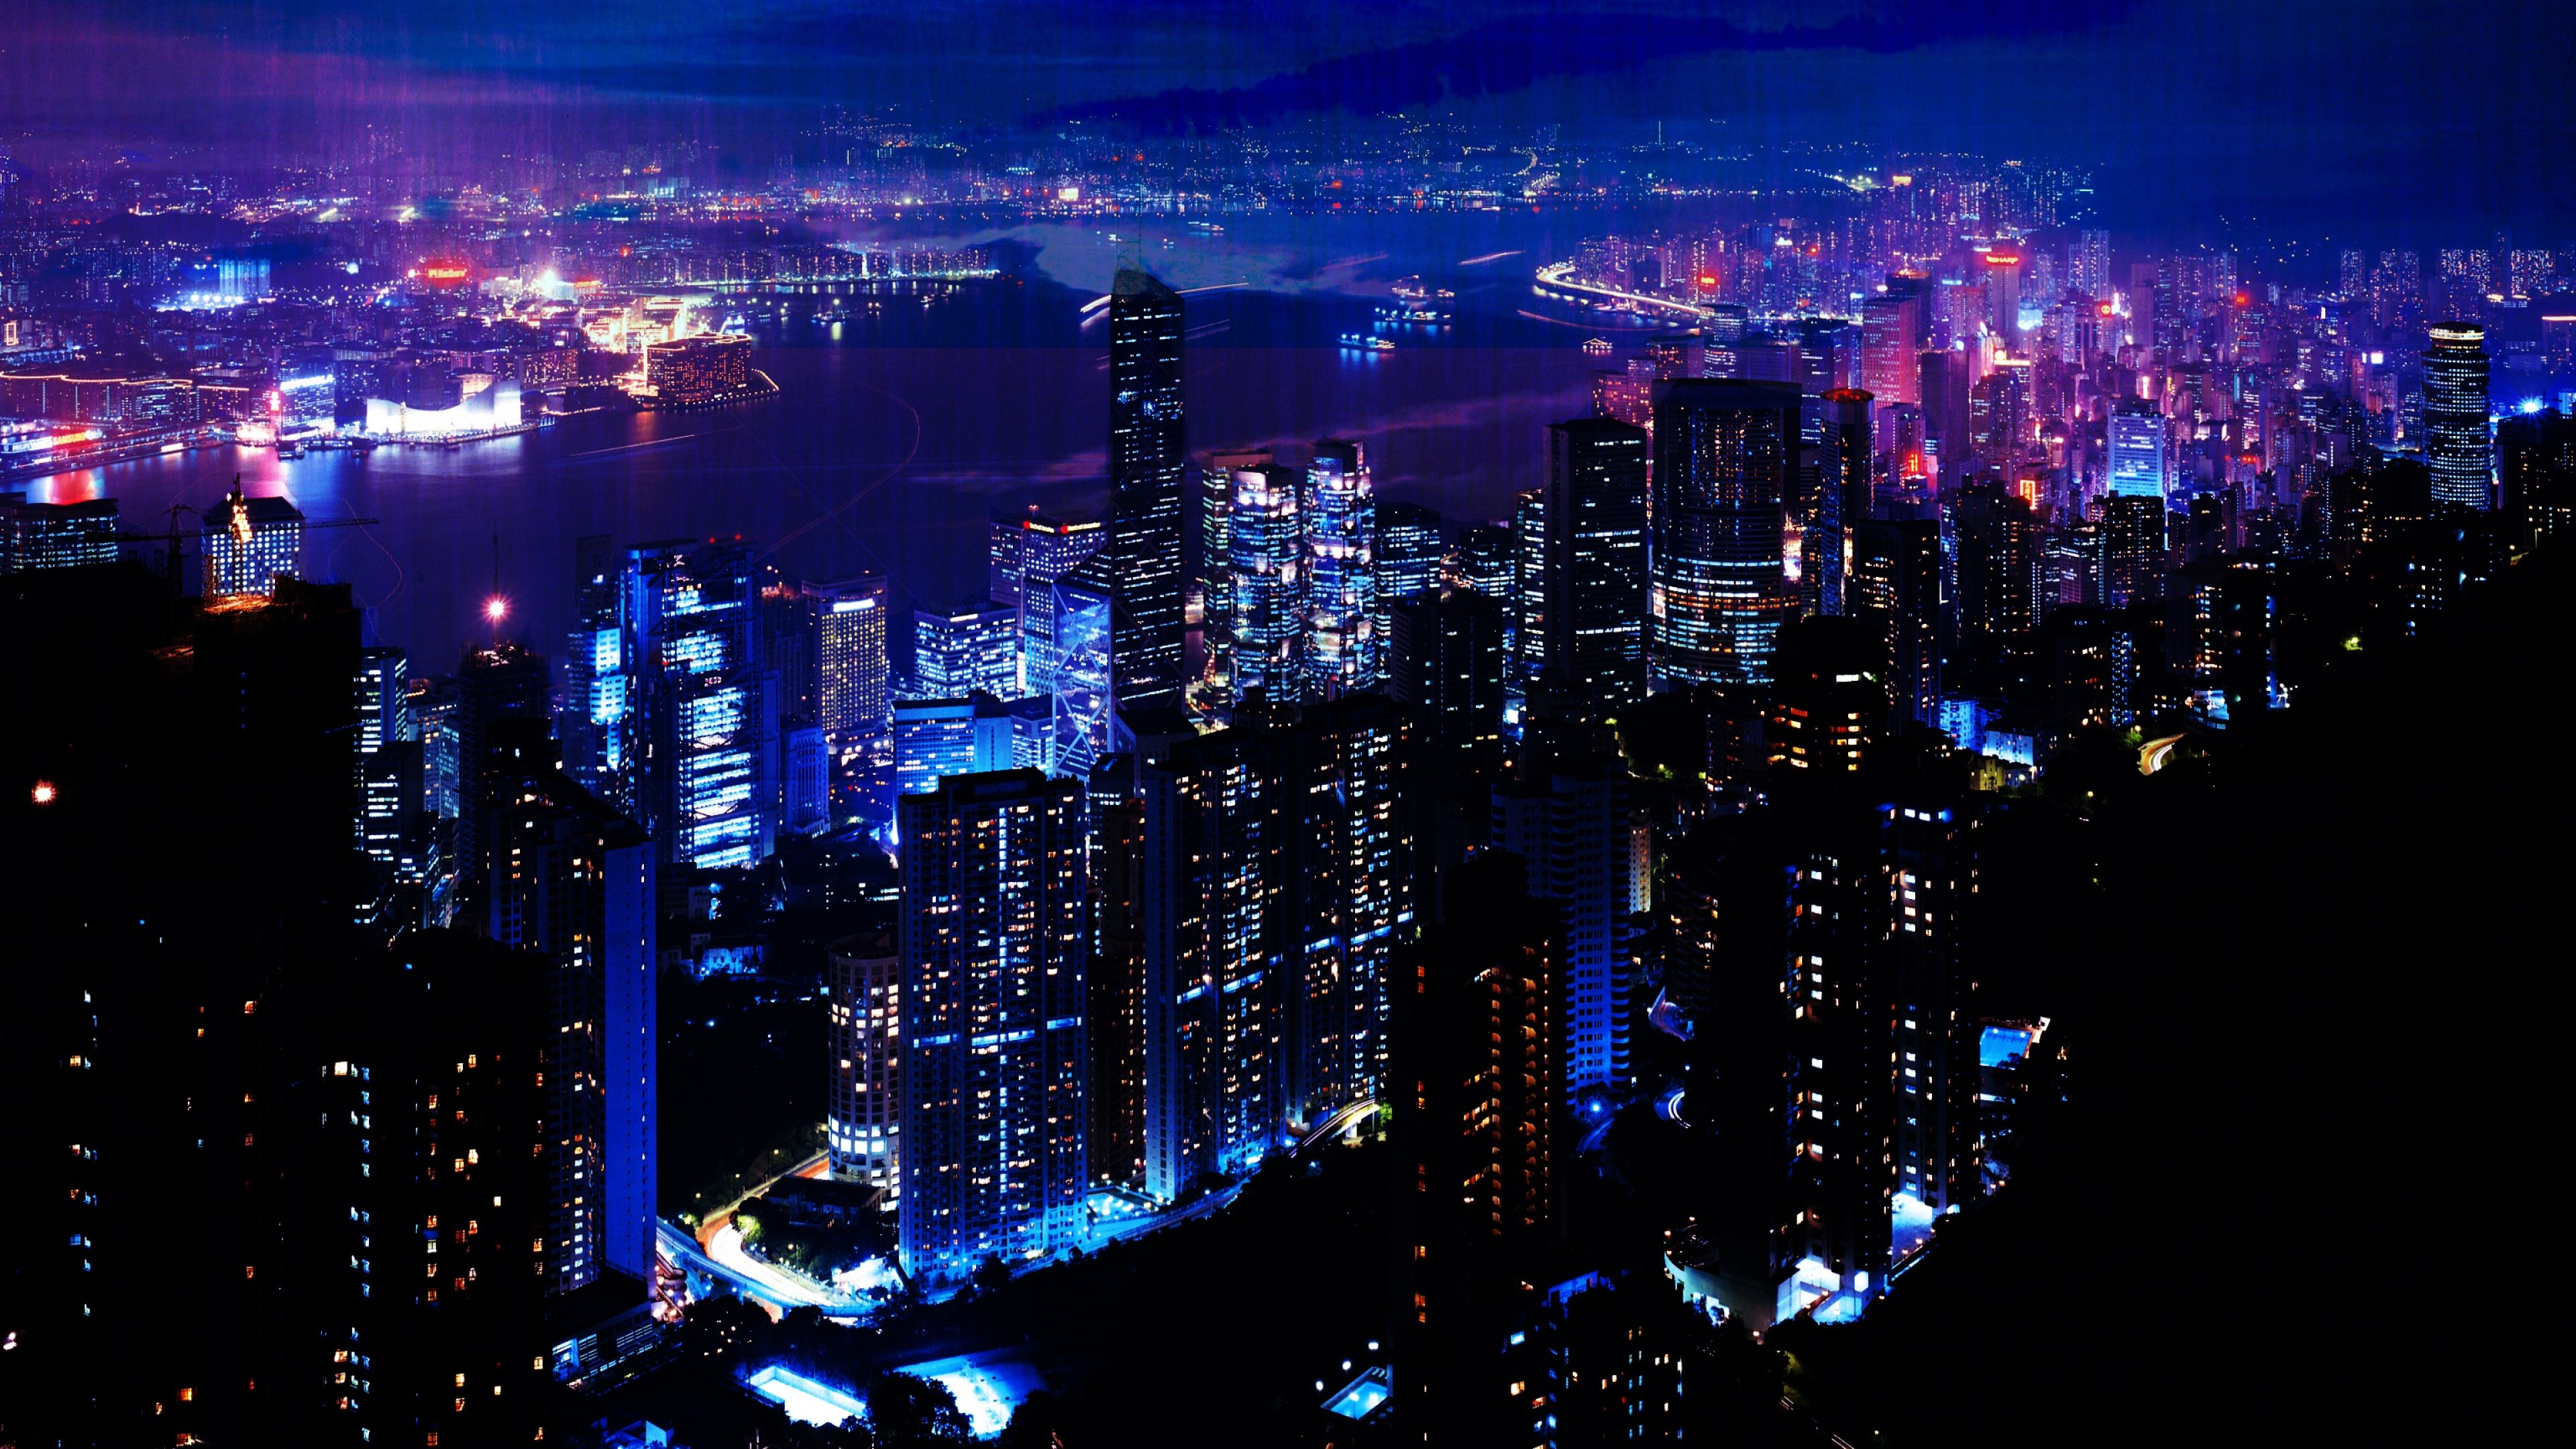 4k Resolution Background Hd Wallpaper Wiki City Wallpaper Aesthetic Desktop Wallpaper City Lights Wallpaper